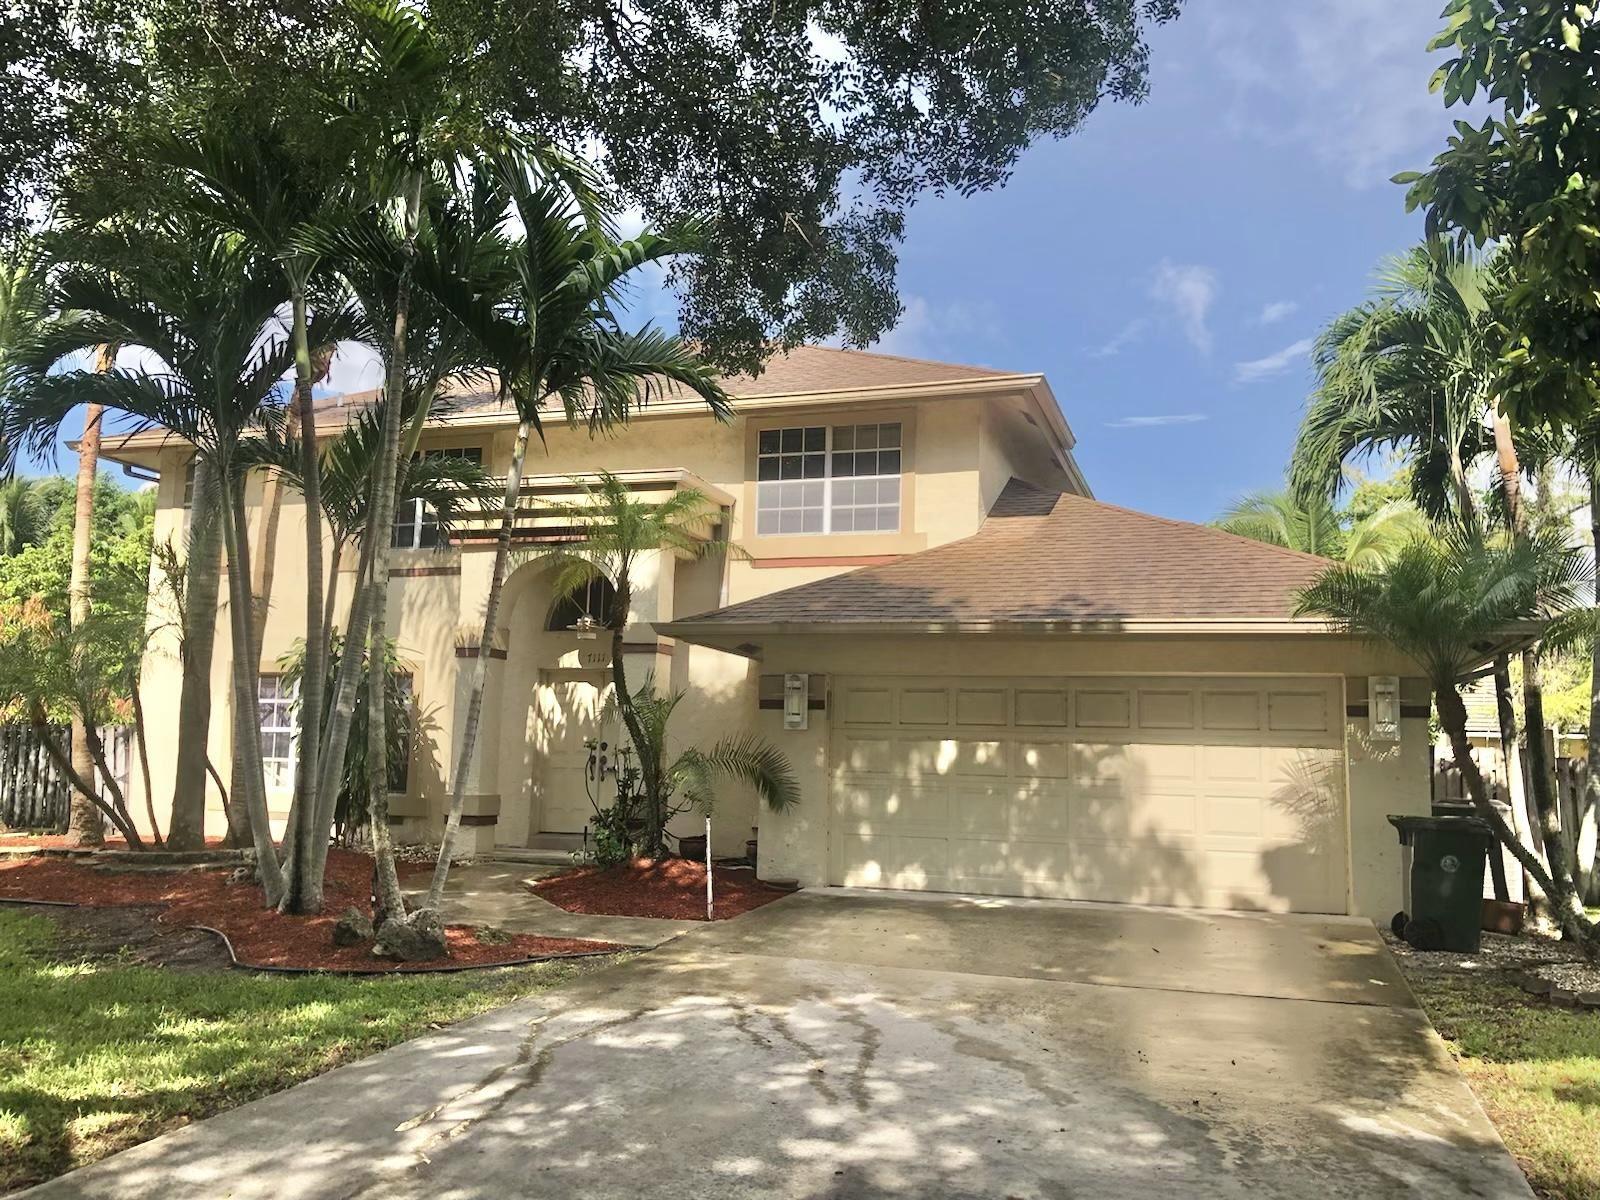 Photo of 7111 NW 44th Lane, Coconut Creek, FL 33073 (MLS # RX-10731807)